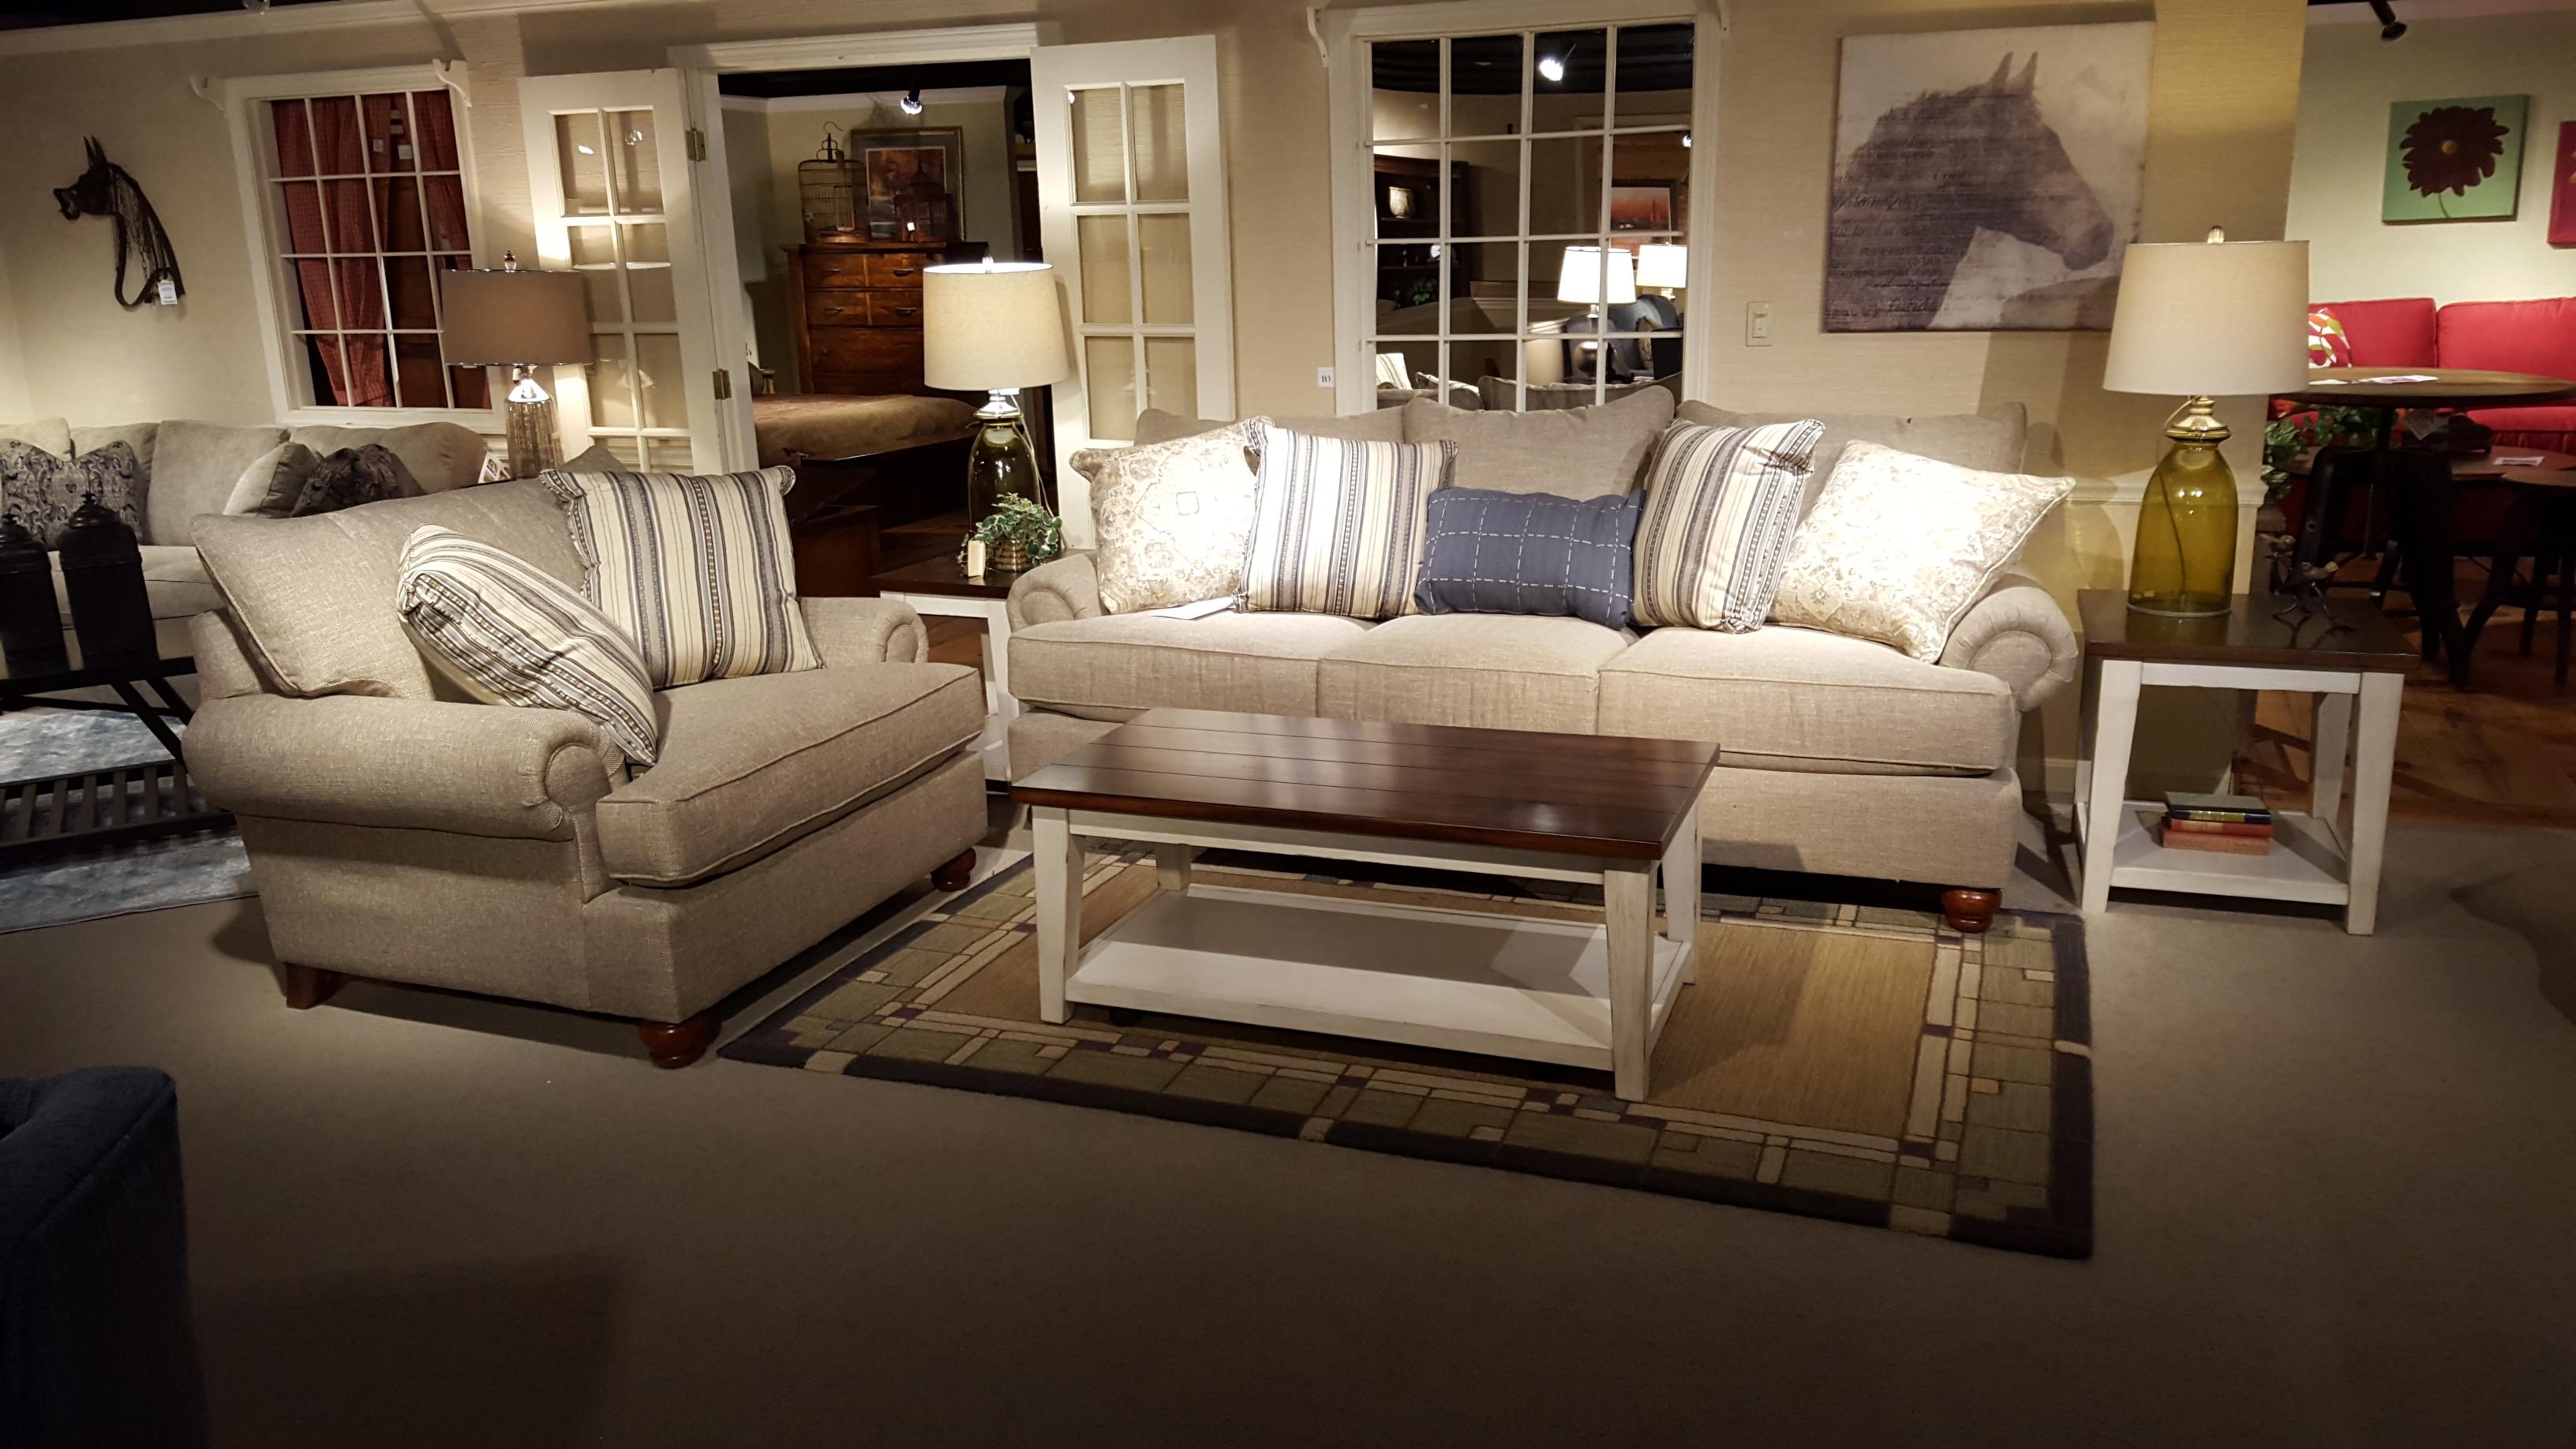 Craftmaster 797050pc One Big Sofa Furniture Store Bangor Maine Living Room Dining Room